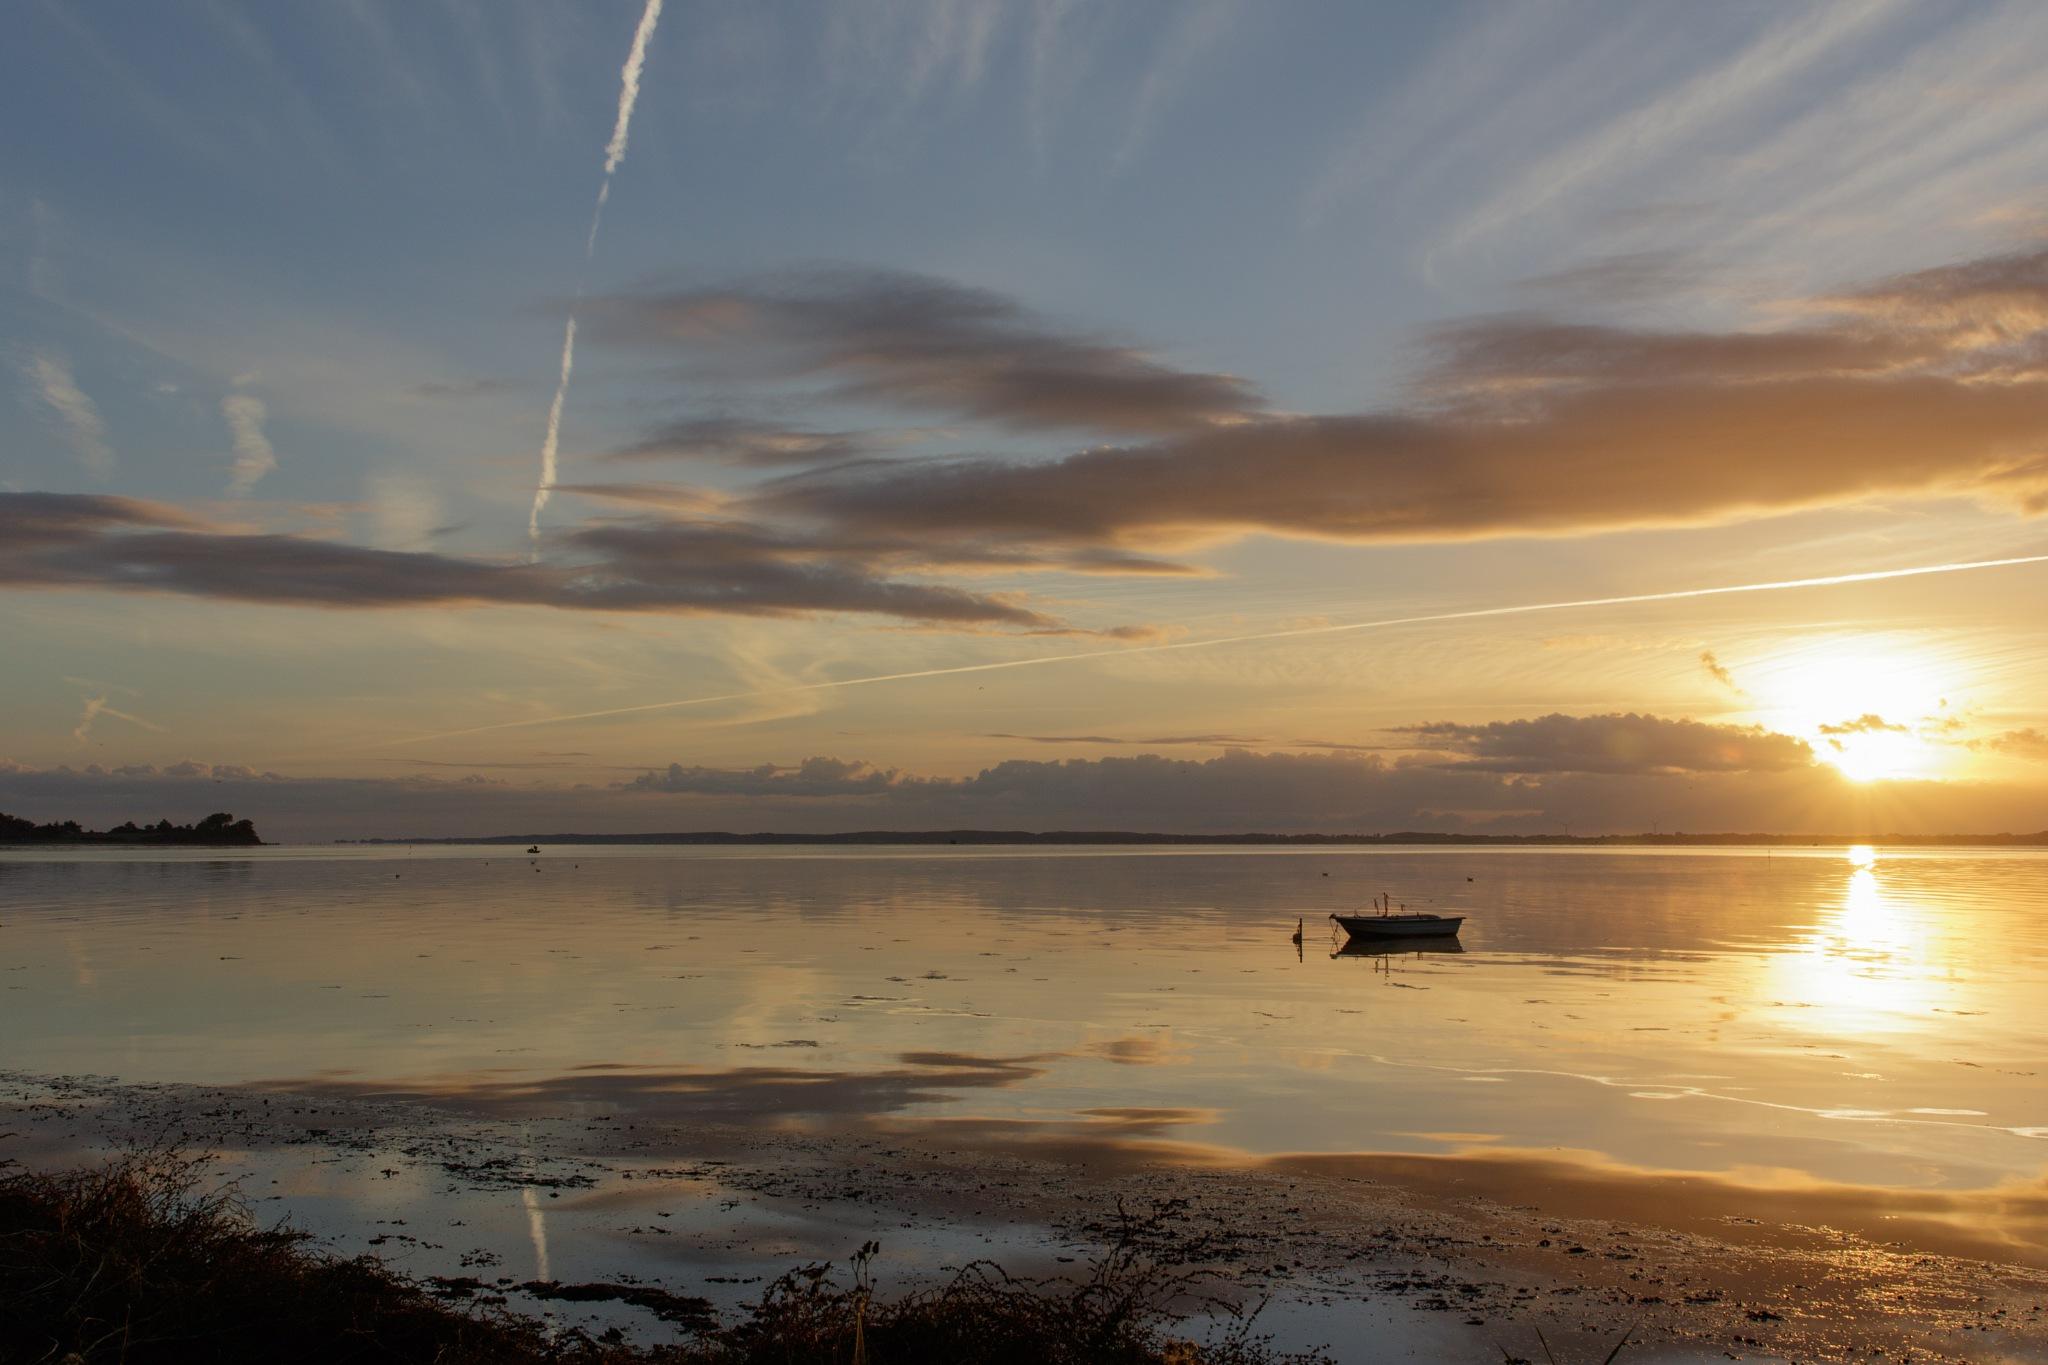 Morning scenery by Bjarne Gertz Pedersen